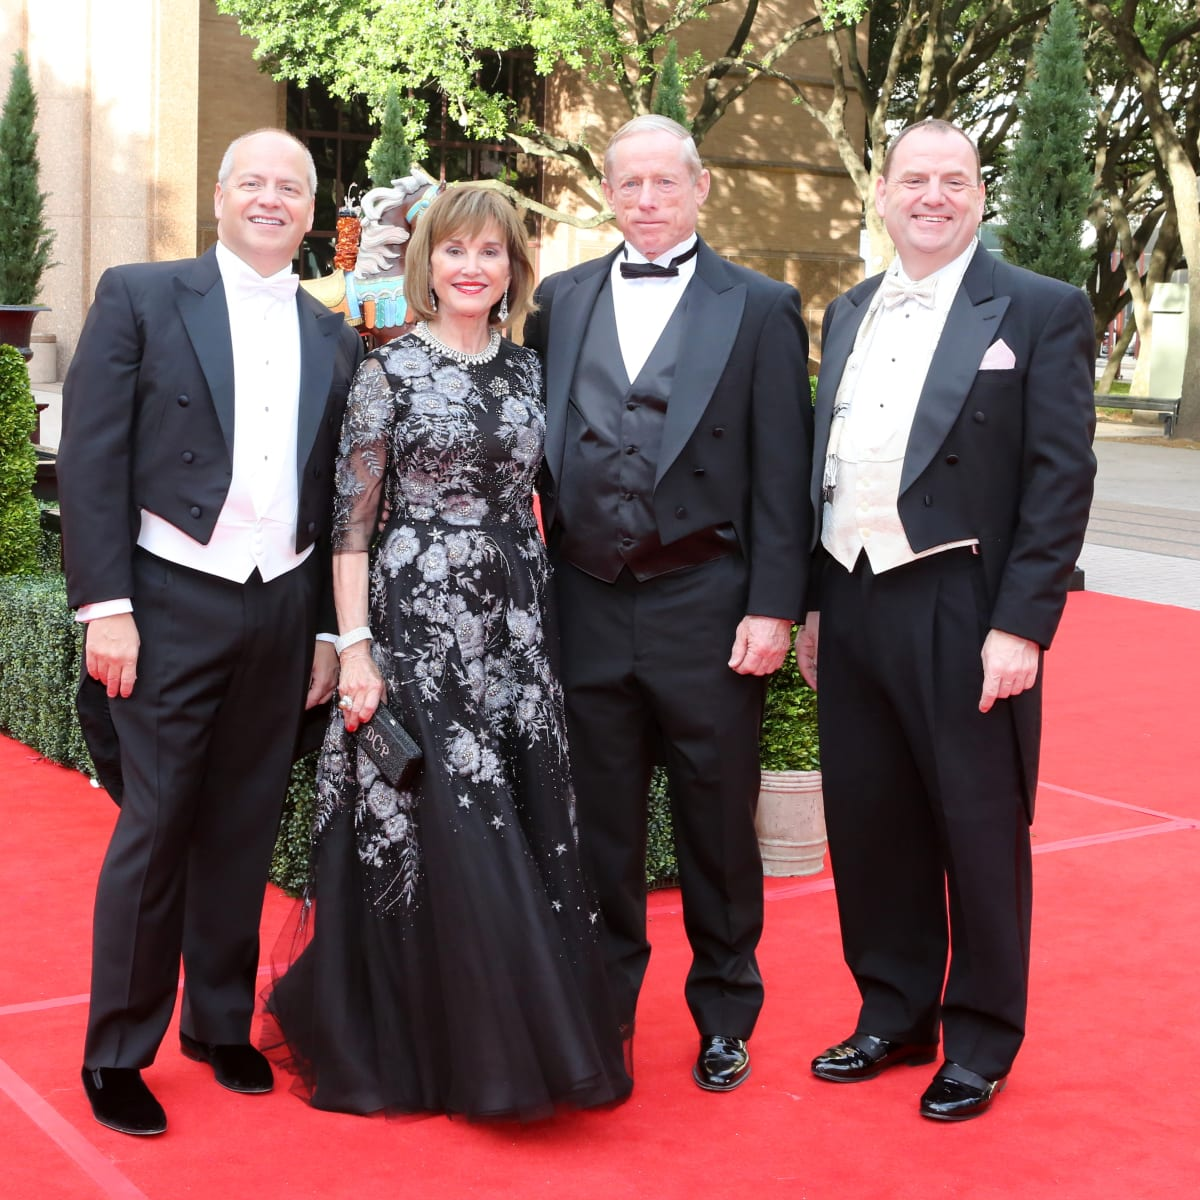 Houston Grand Opera Ball, 4/16 Patrick Summers, Donna Josey Chapman, Max Chapman Jr., Perryn Leech